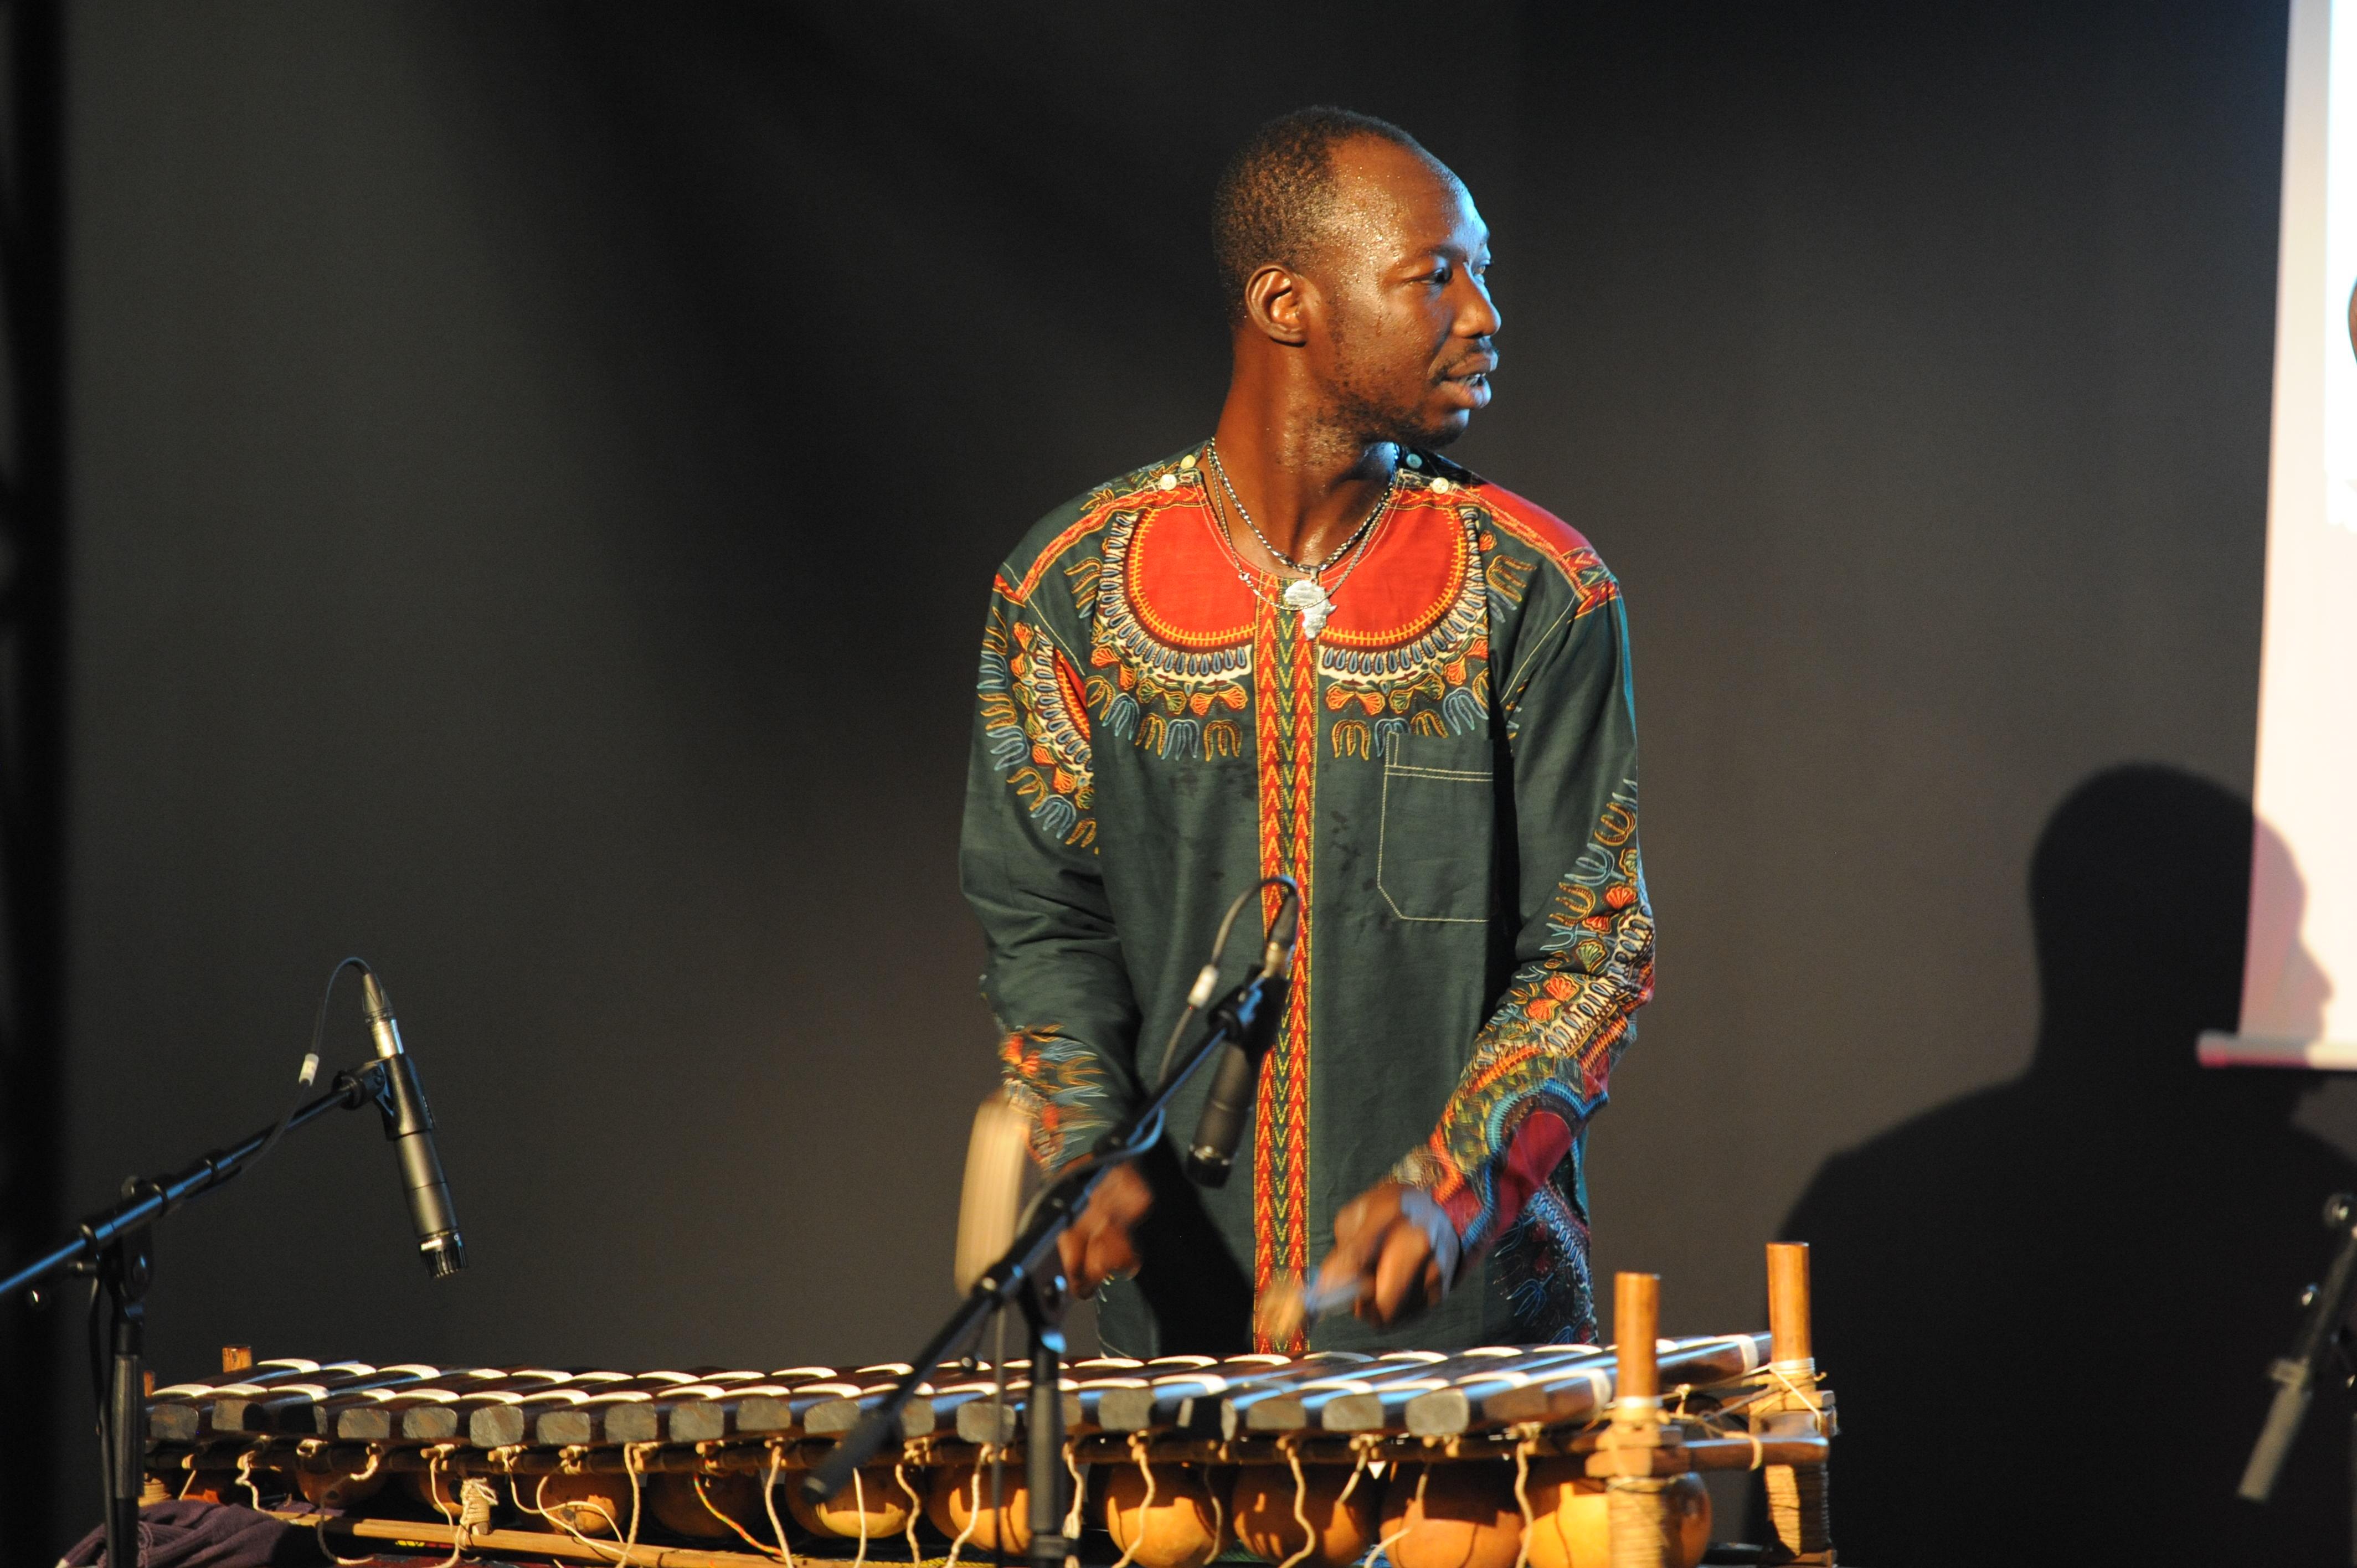 Abdoulaye Dembele